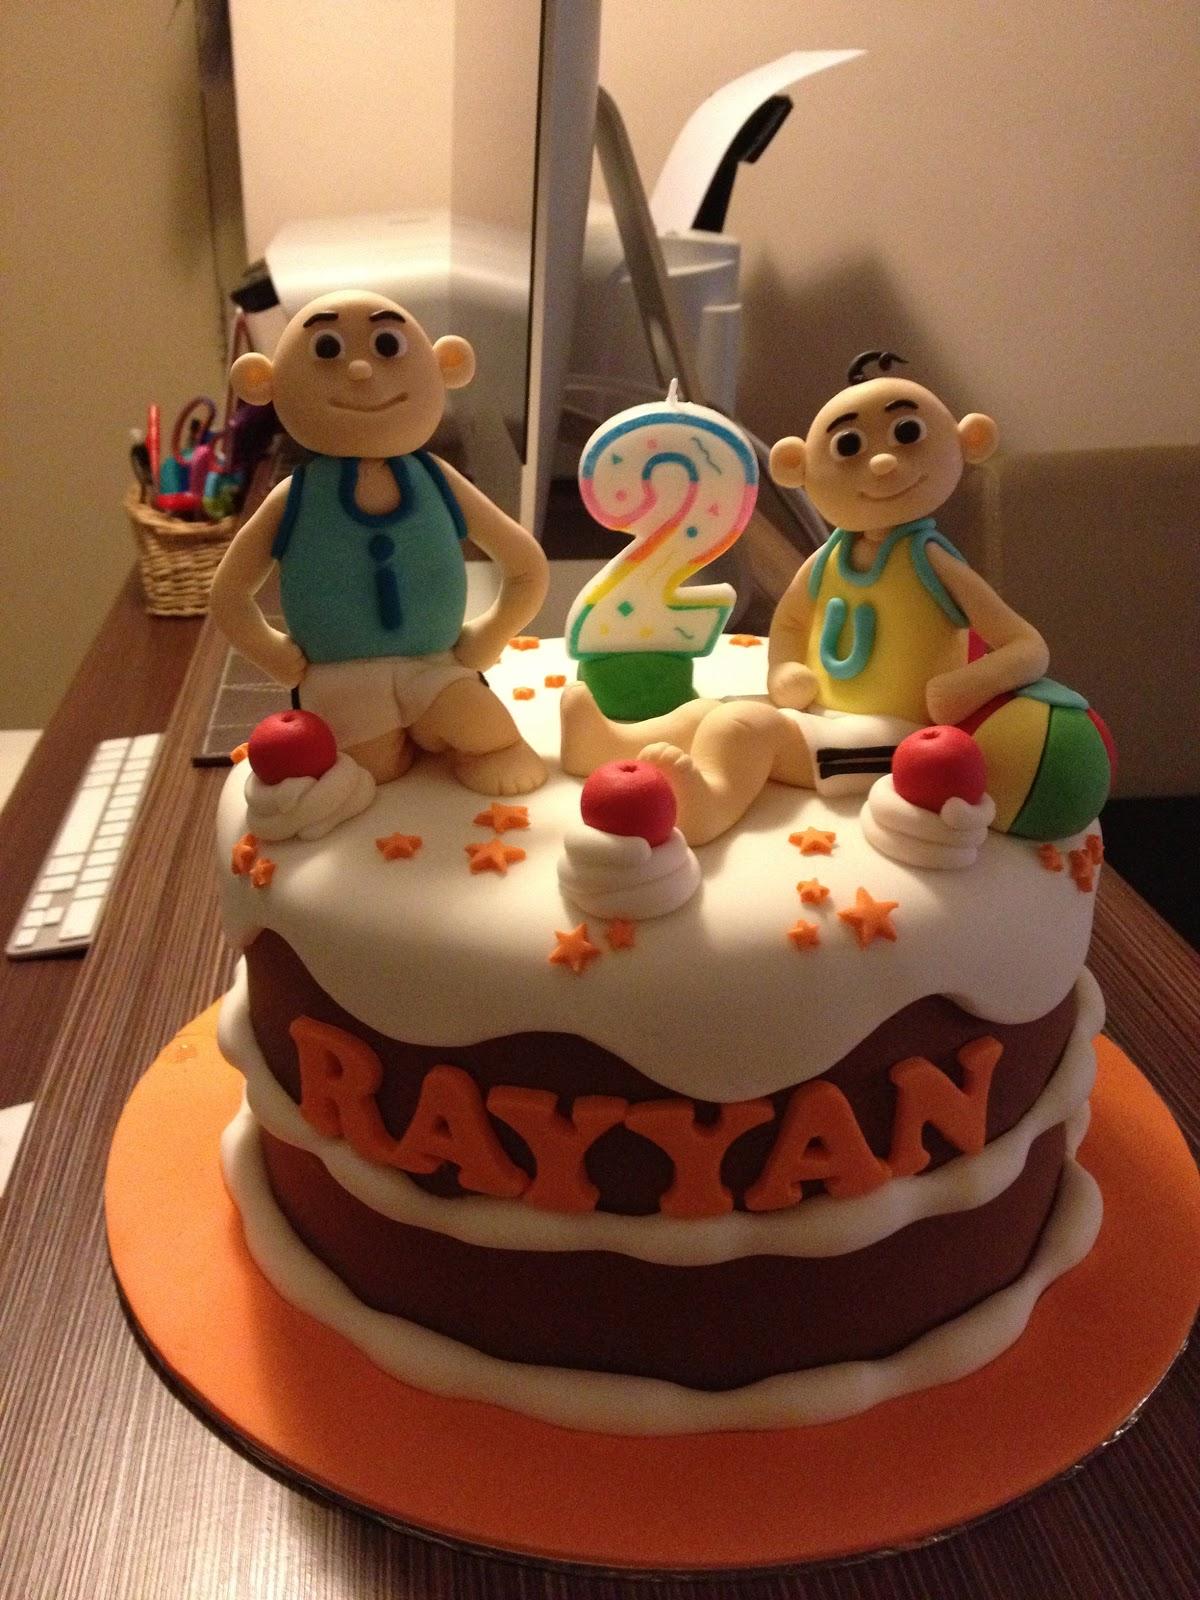 CoMeLiCiOuS: Upin & Ipin Cake